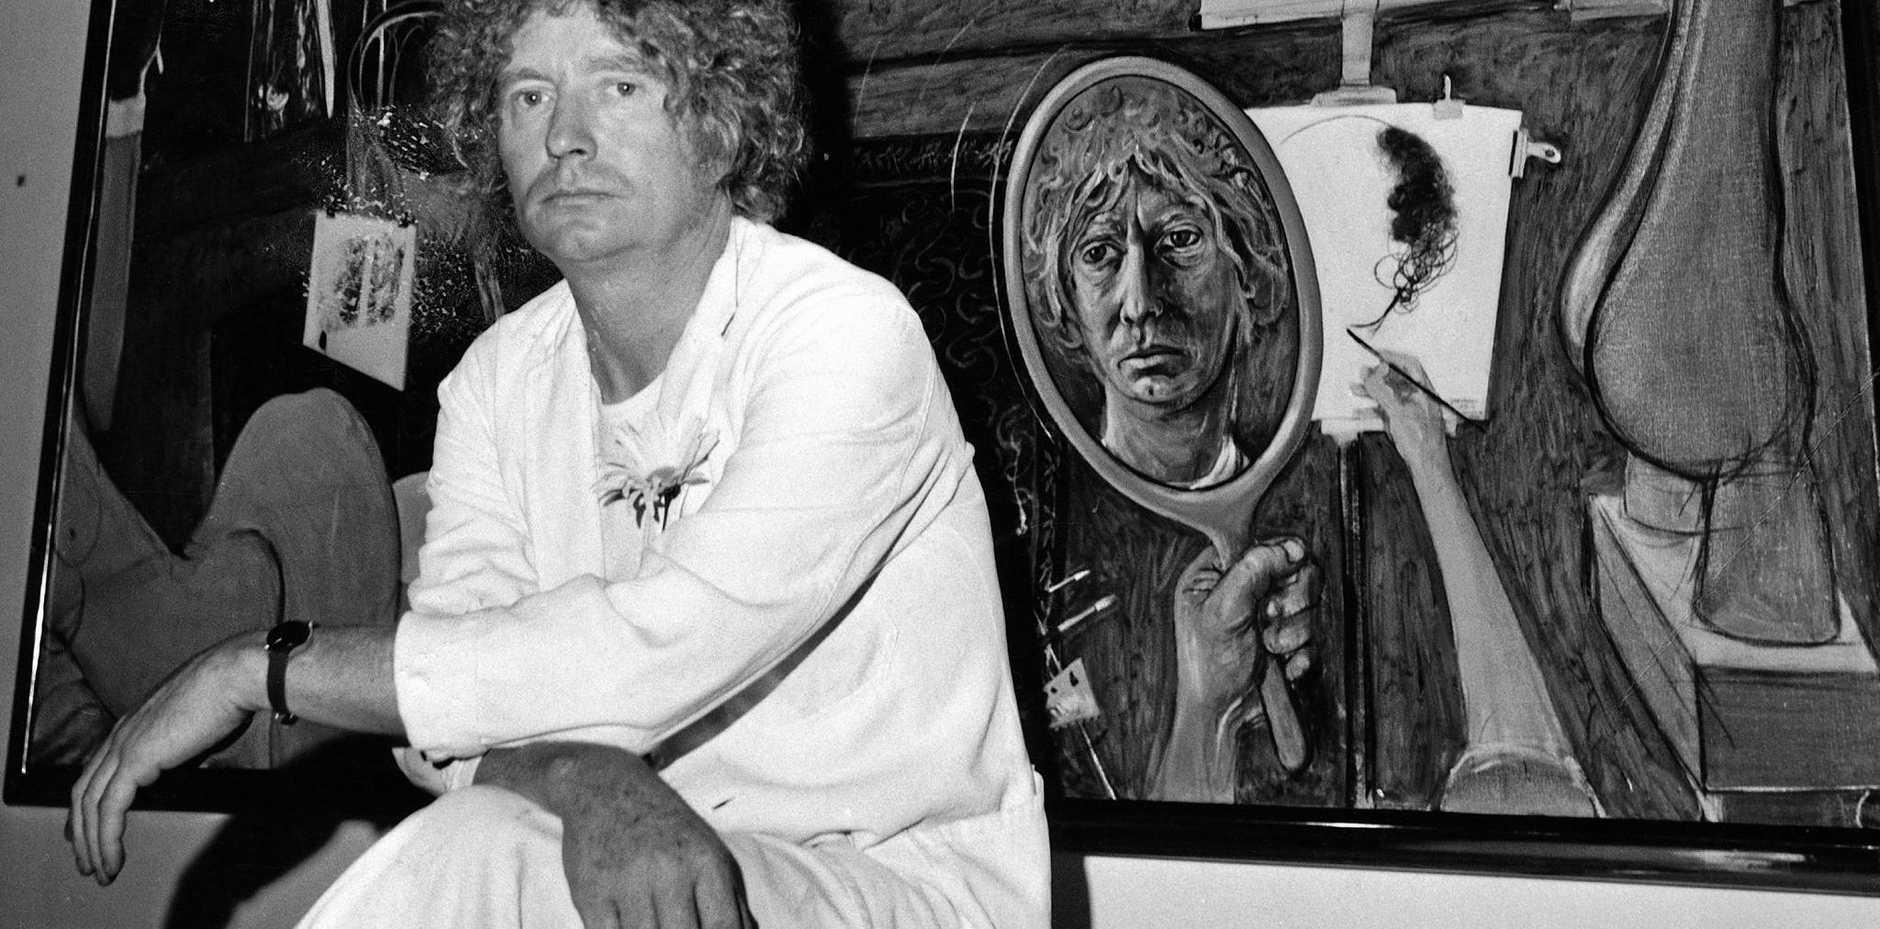 FESTIVAL HIGHLIGT: Late Australian artist Brett Whiteley comes under the spotlight in the Australian premiere of the documentary Whiteley, directed by James Bogle.